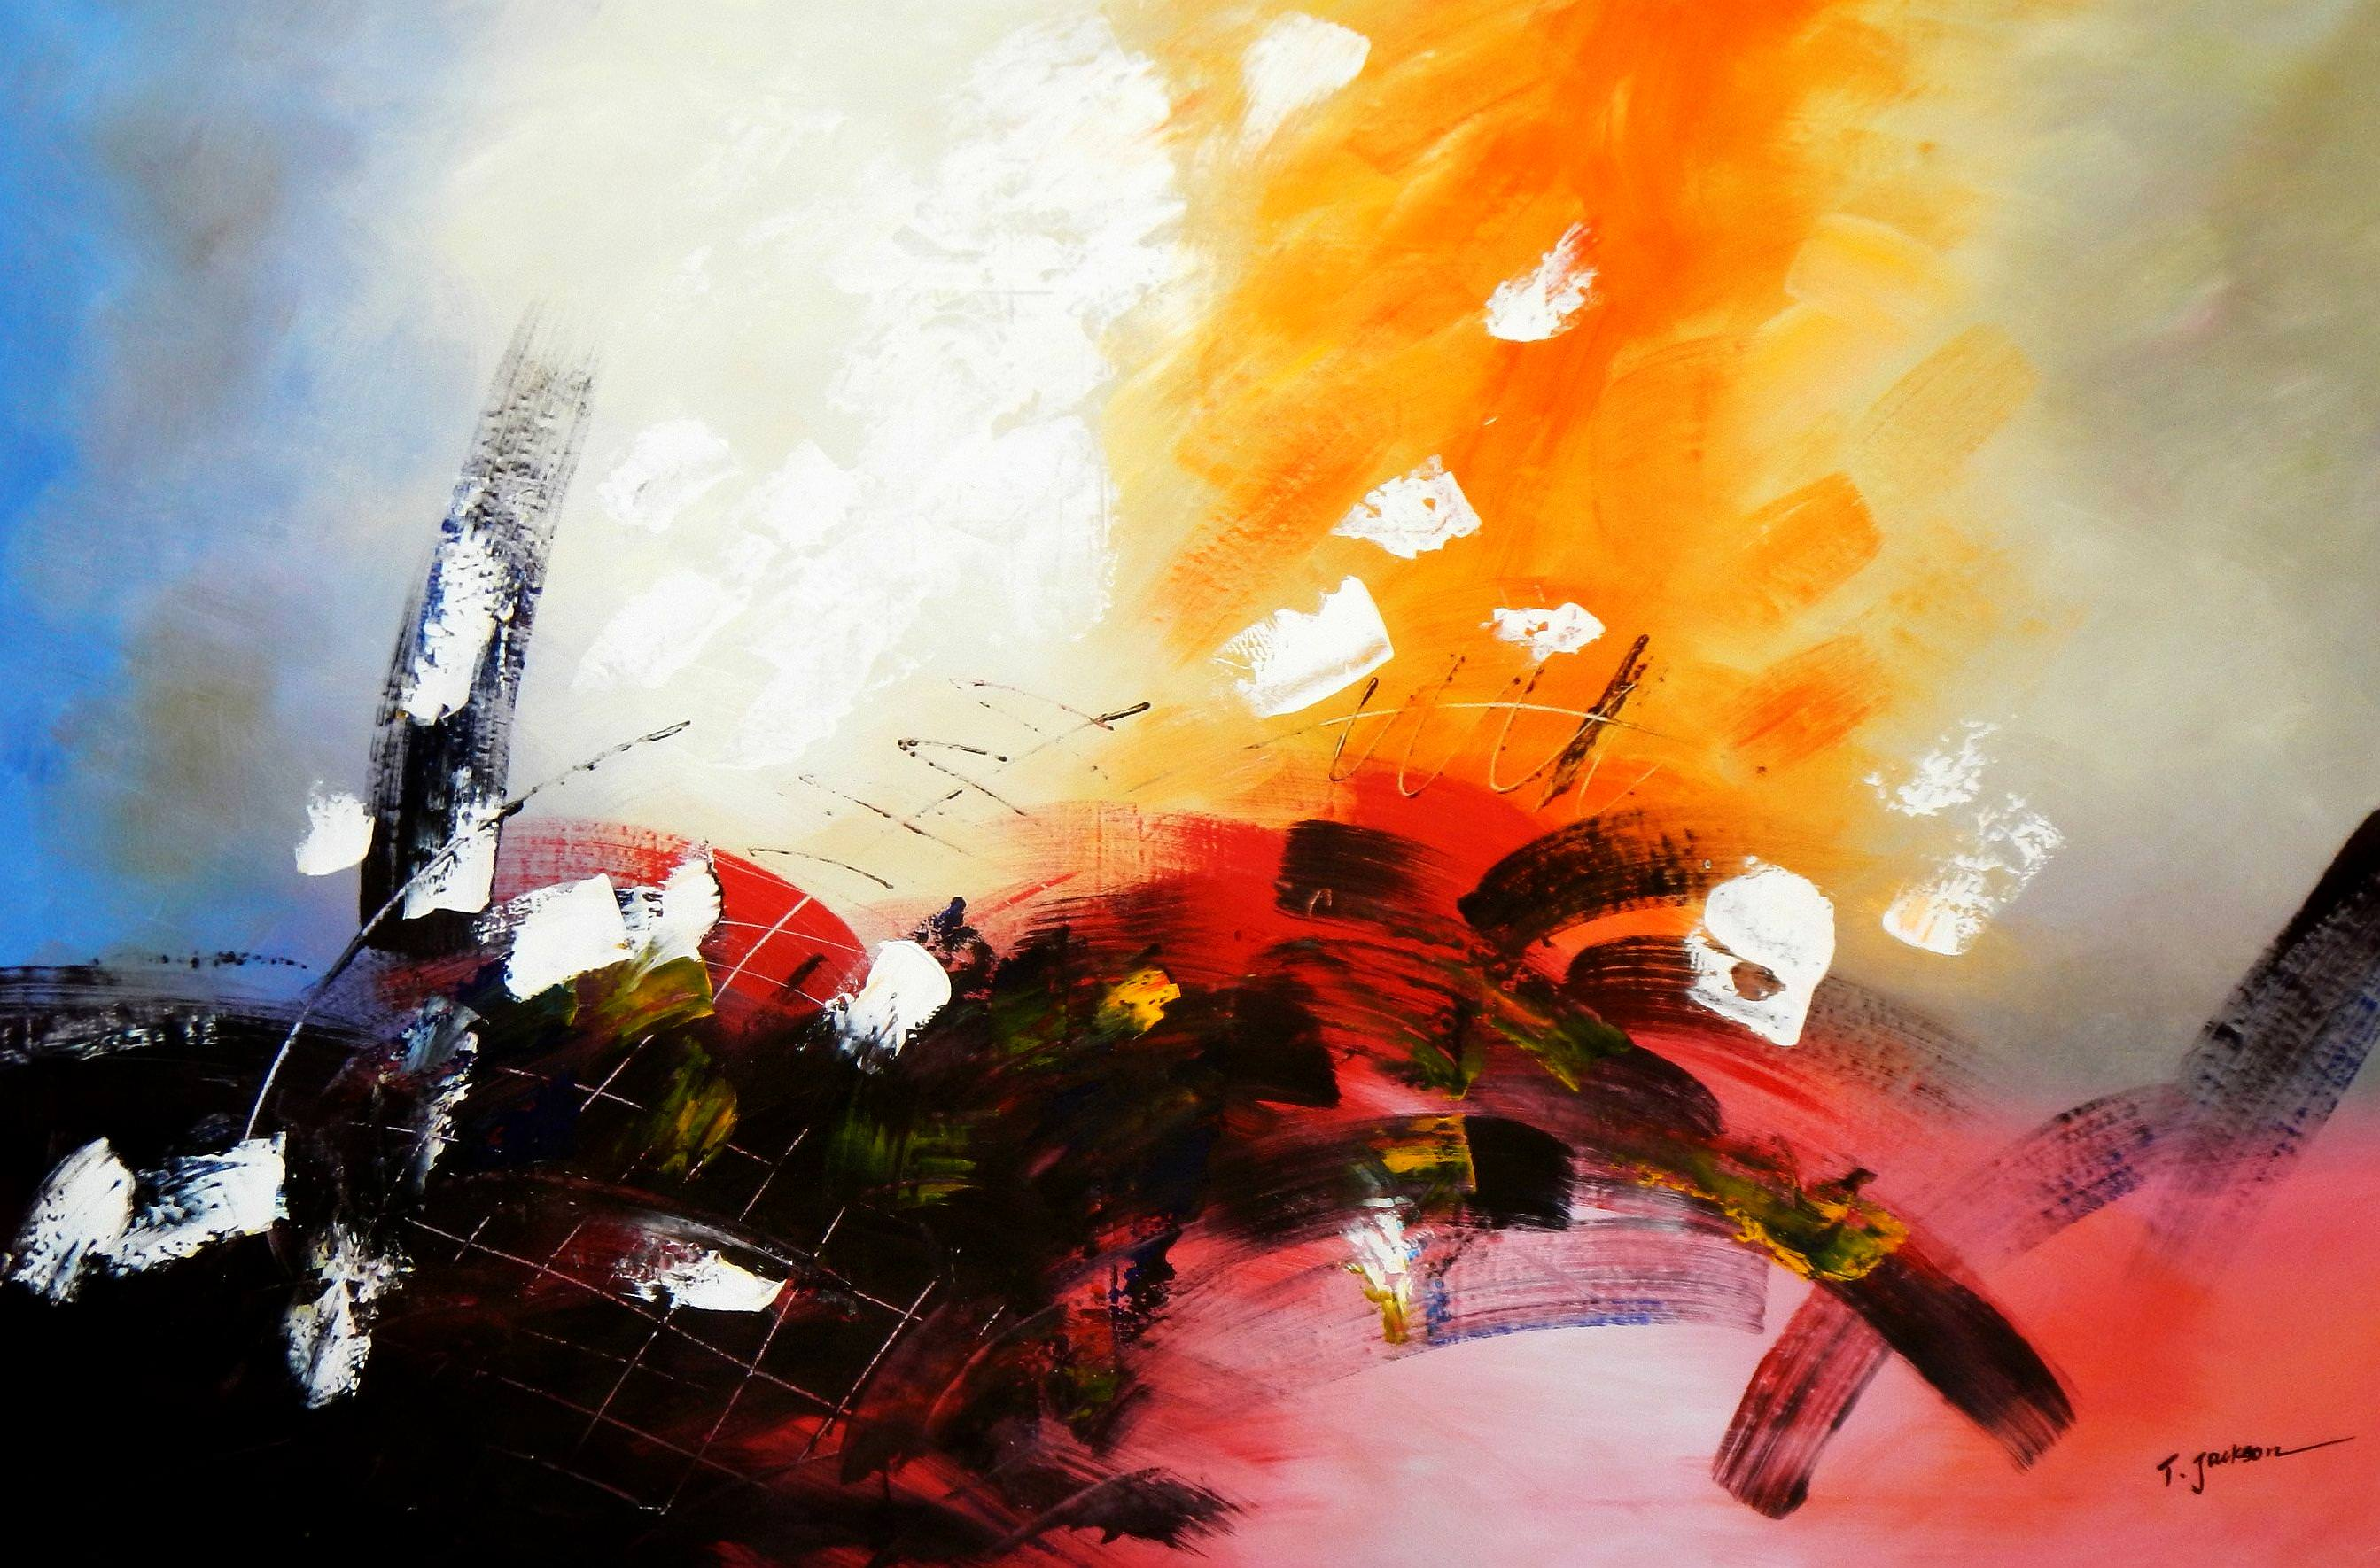 Abstrakt - Rhythm of light p94121 120x180cm abstraktes Ölbild handgemalt